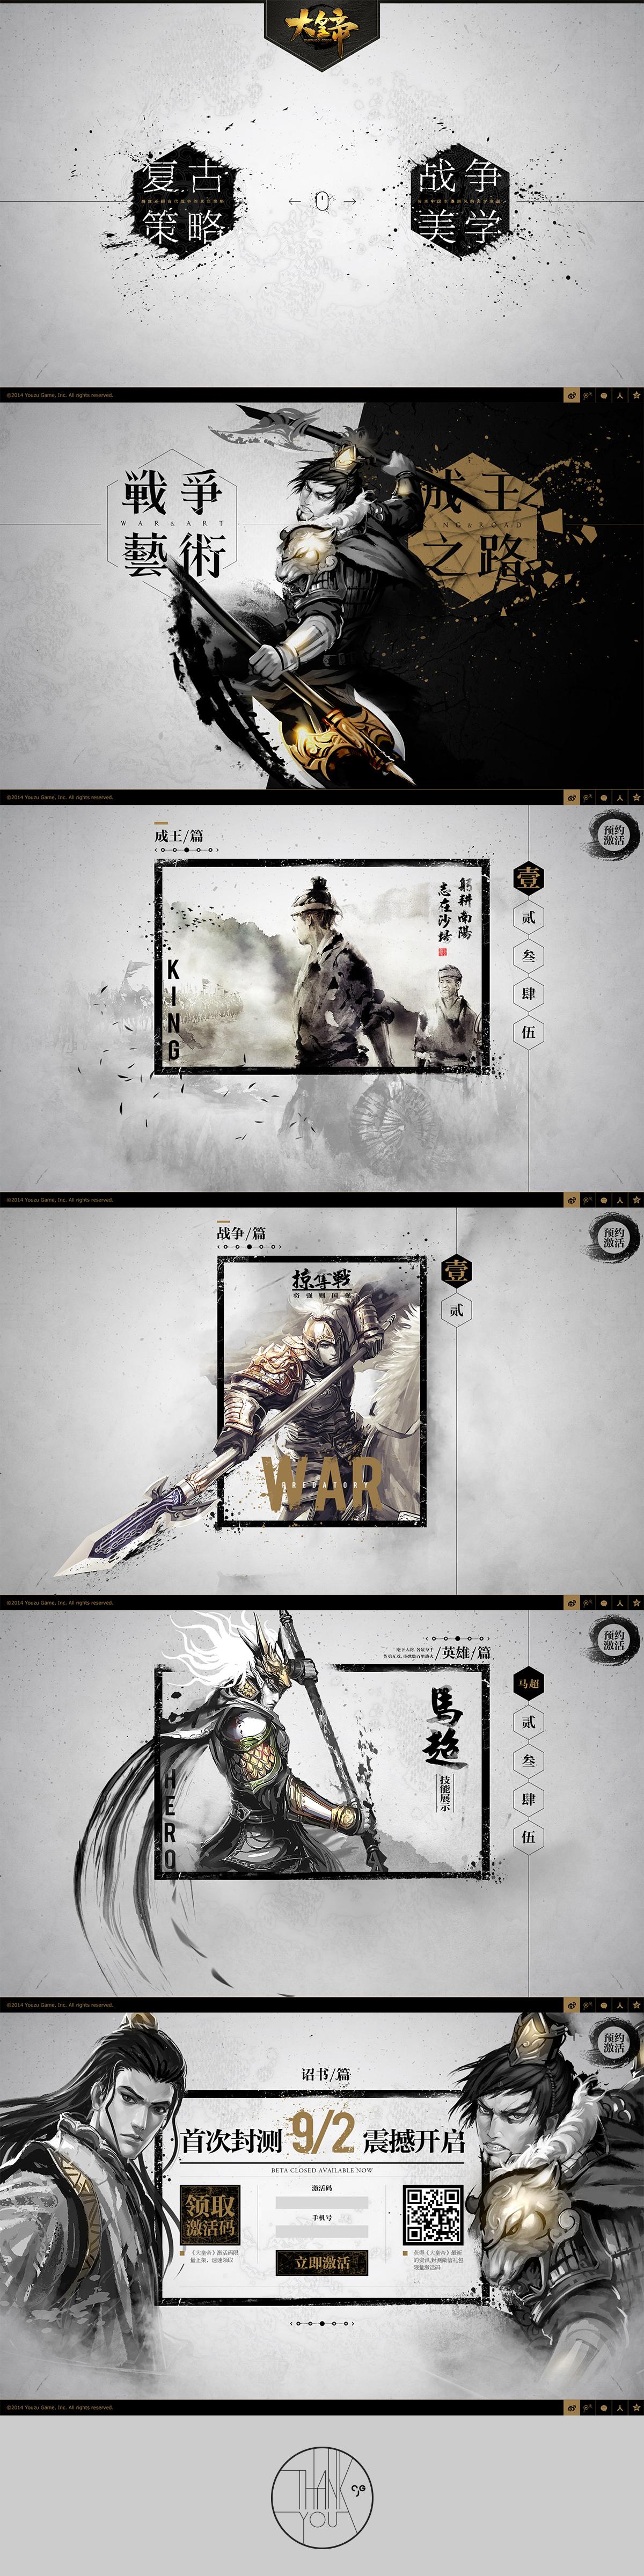 WAR ART by onejian